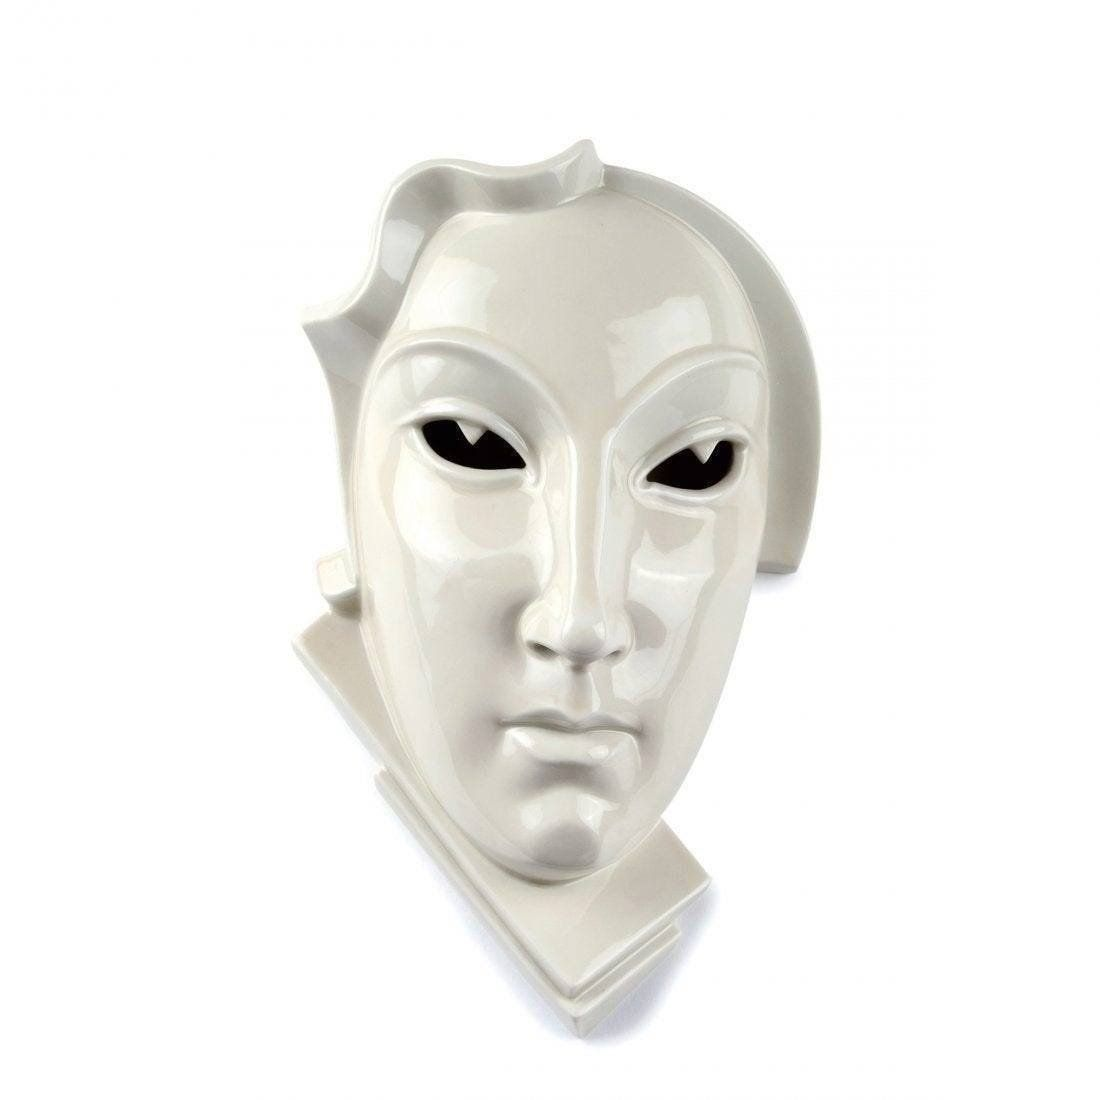 Ca. 1926 Rare Art Deco Rosenthal LG Porcelain Wall Mask